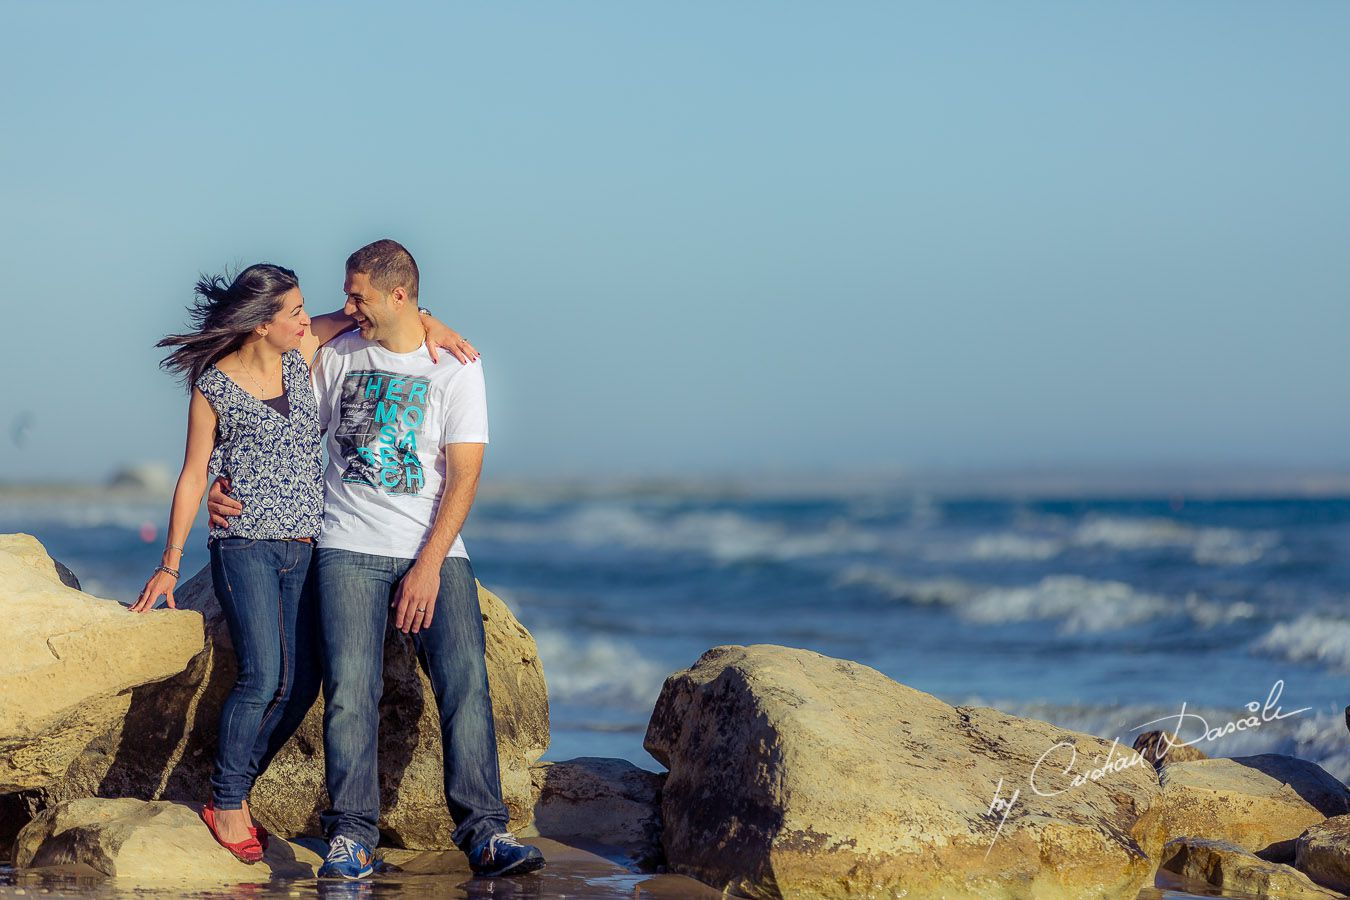 Precious moments: Maria & George at Curium Beach, Cyprus. Photographer: Cristian Dascalu